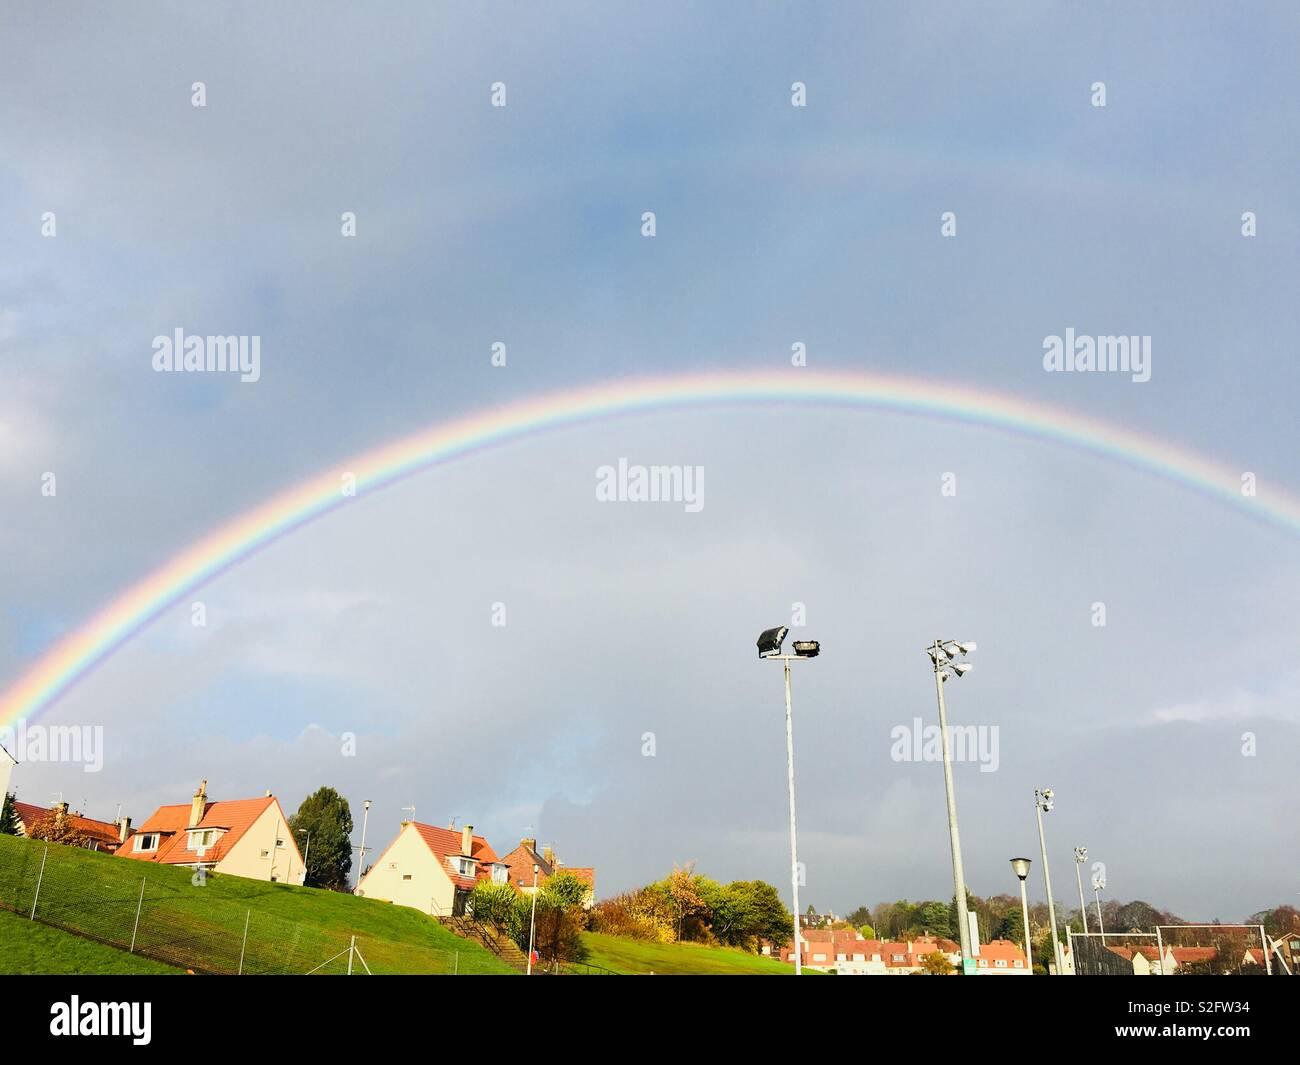 Double rainbow, Aberdeen, Scotland - Stock Image